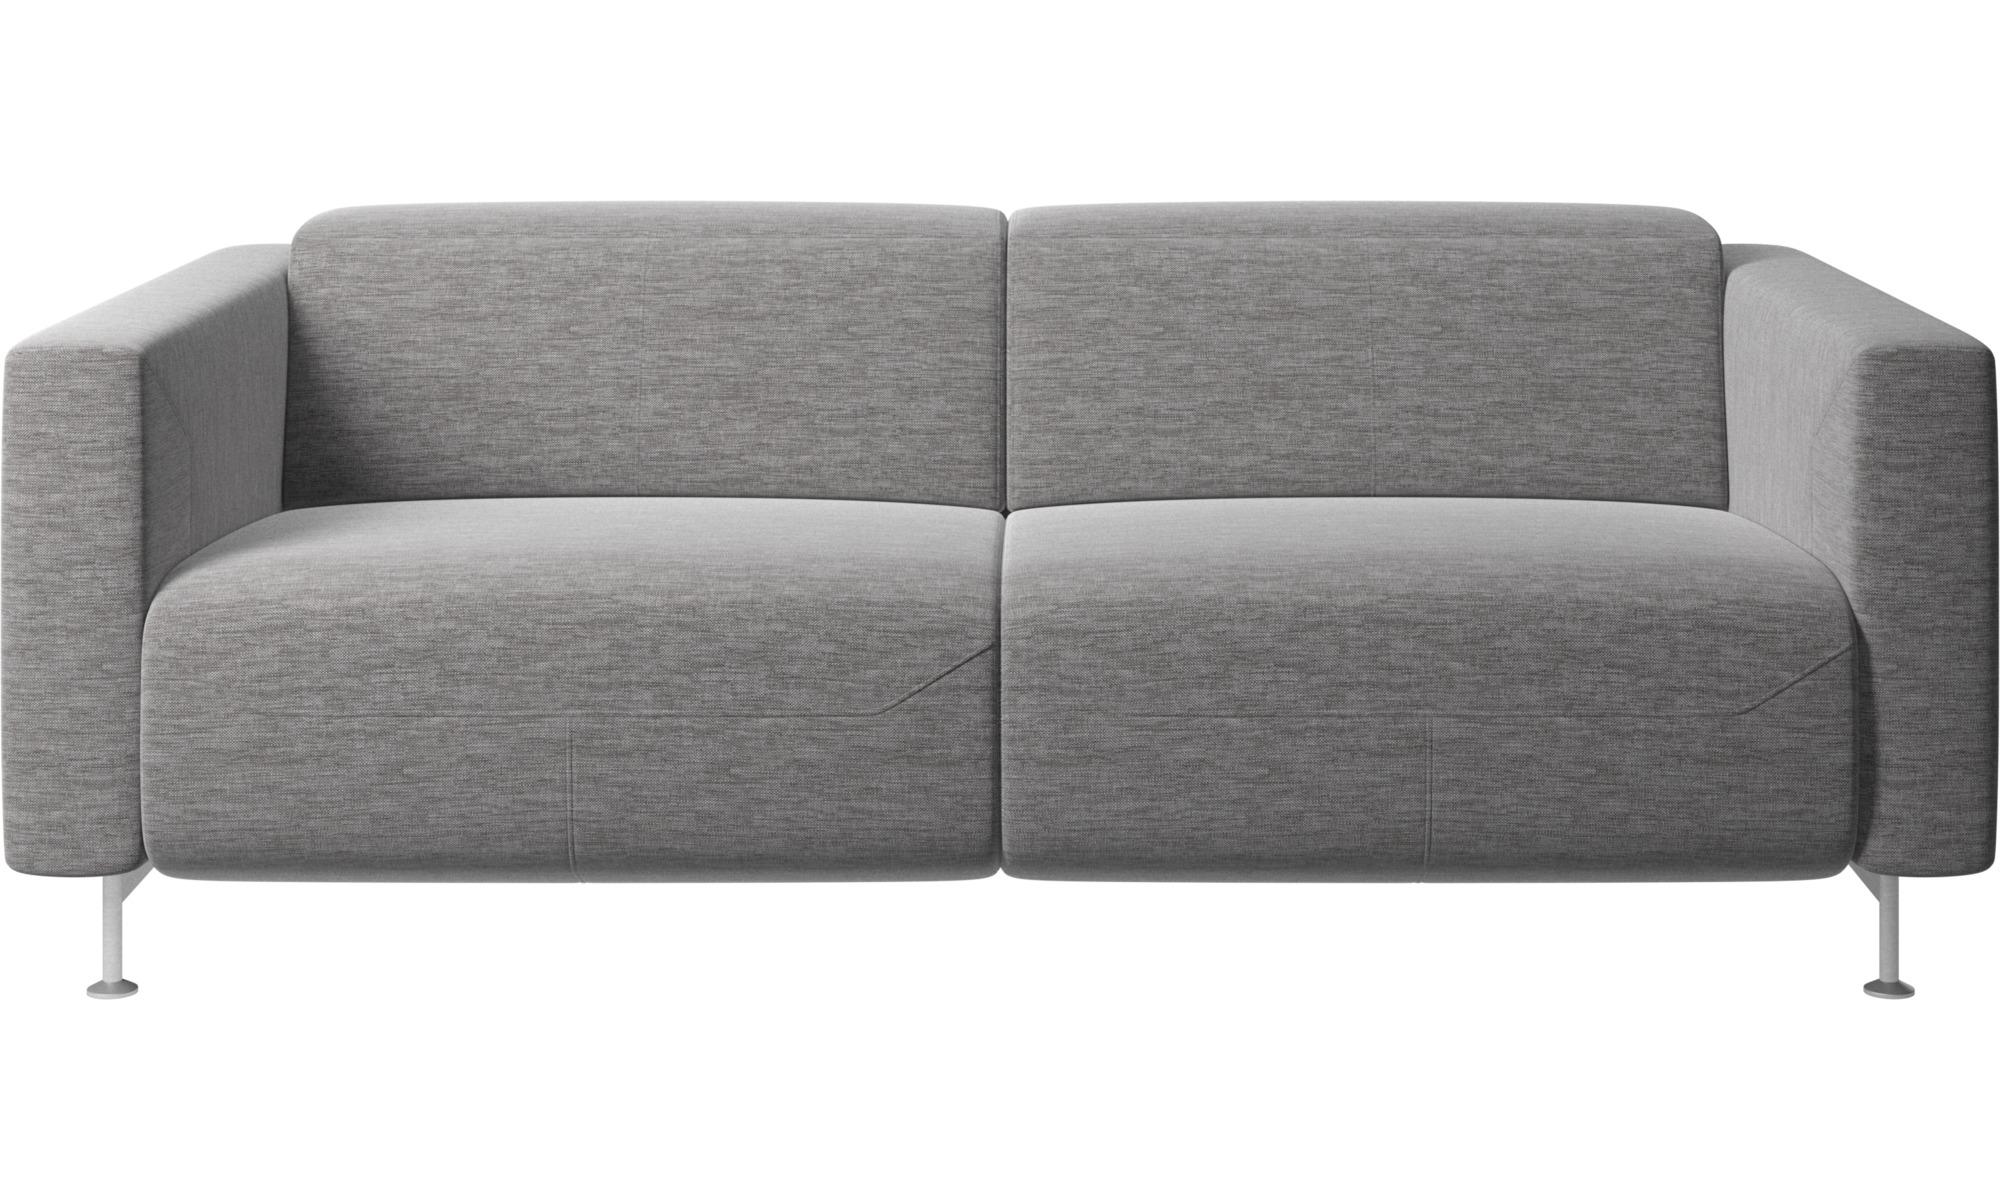 Recliner Sofas Parma Reclining Sofa